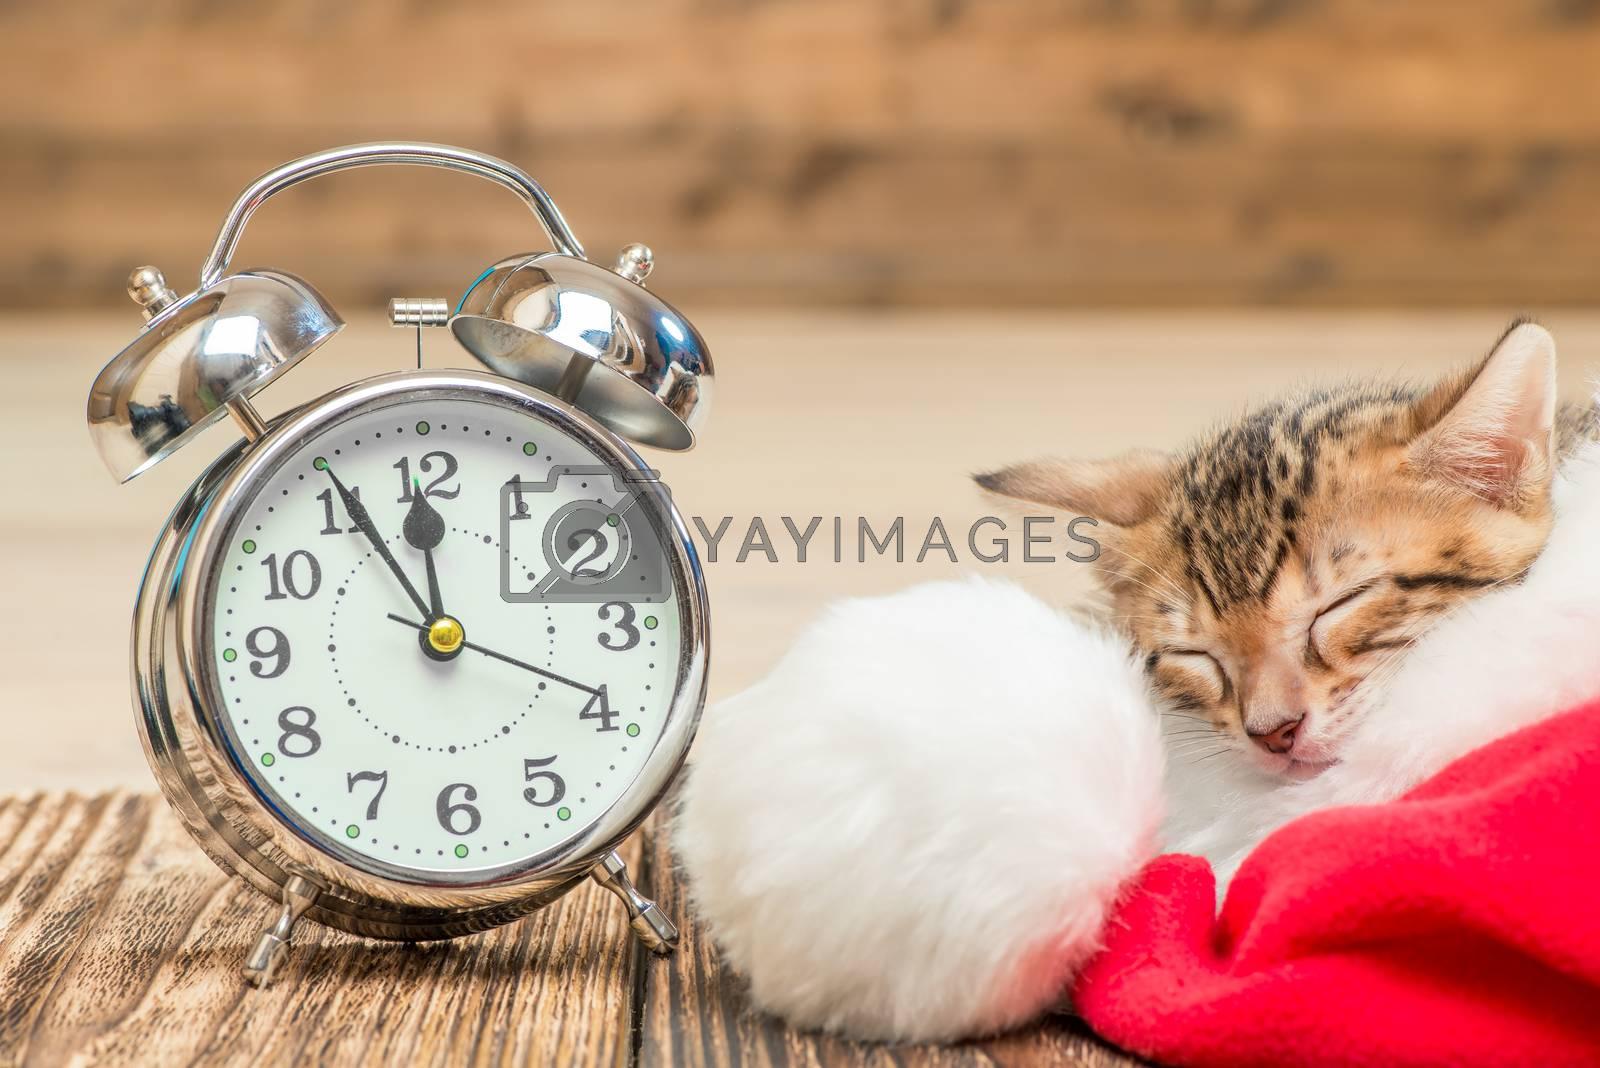 little kitty sleeps in Santa hat next to the alarm clock by Labunskiy K.